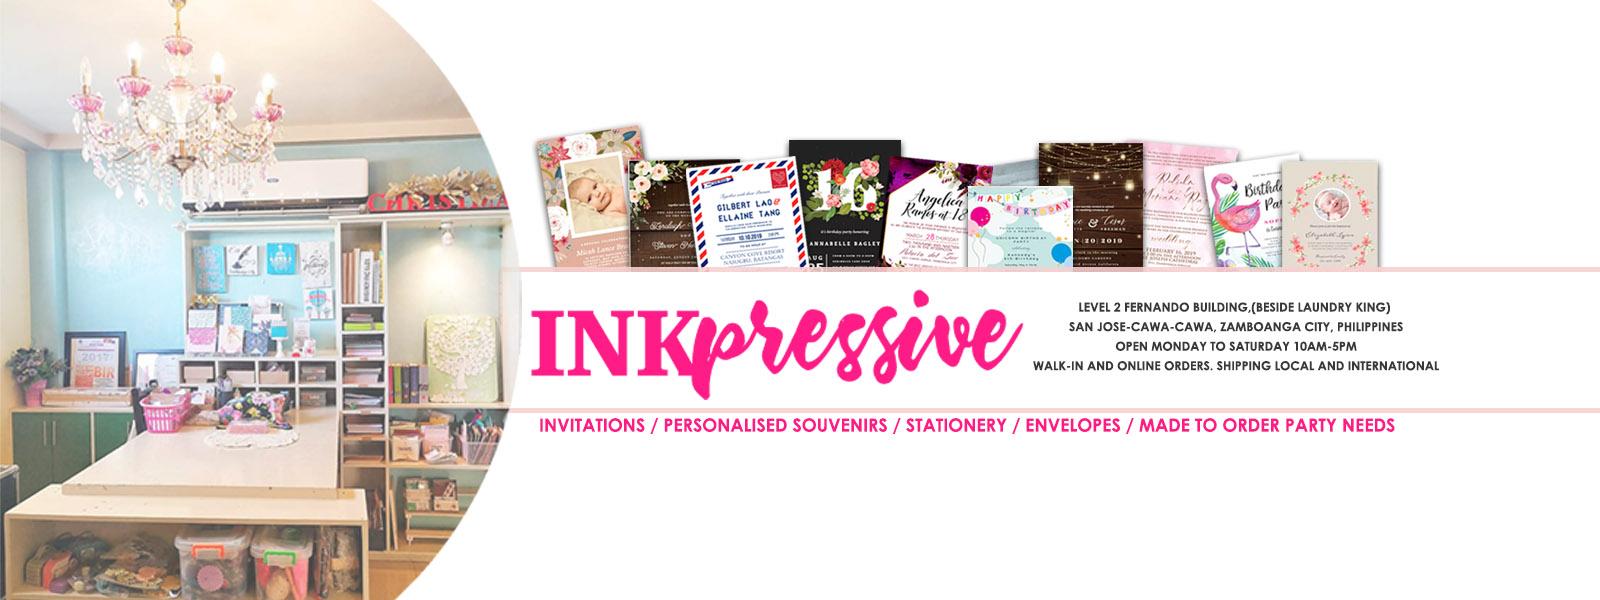 Inkpressive Invitations and Crafts